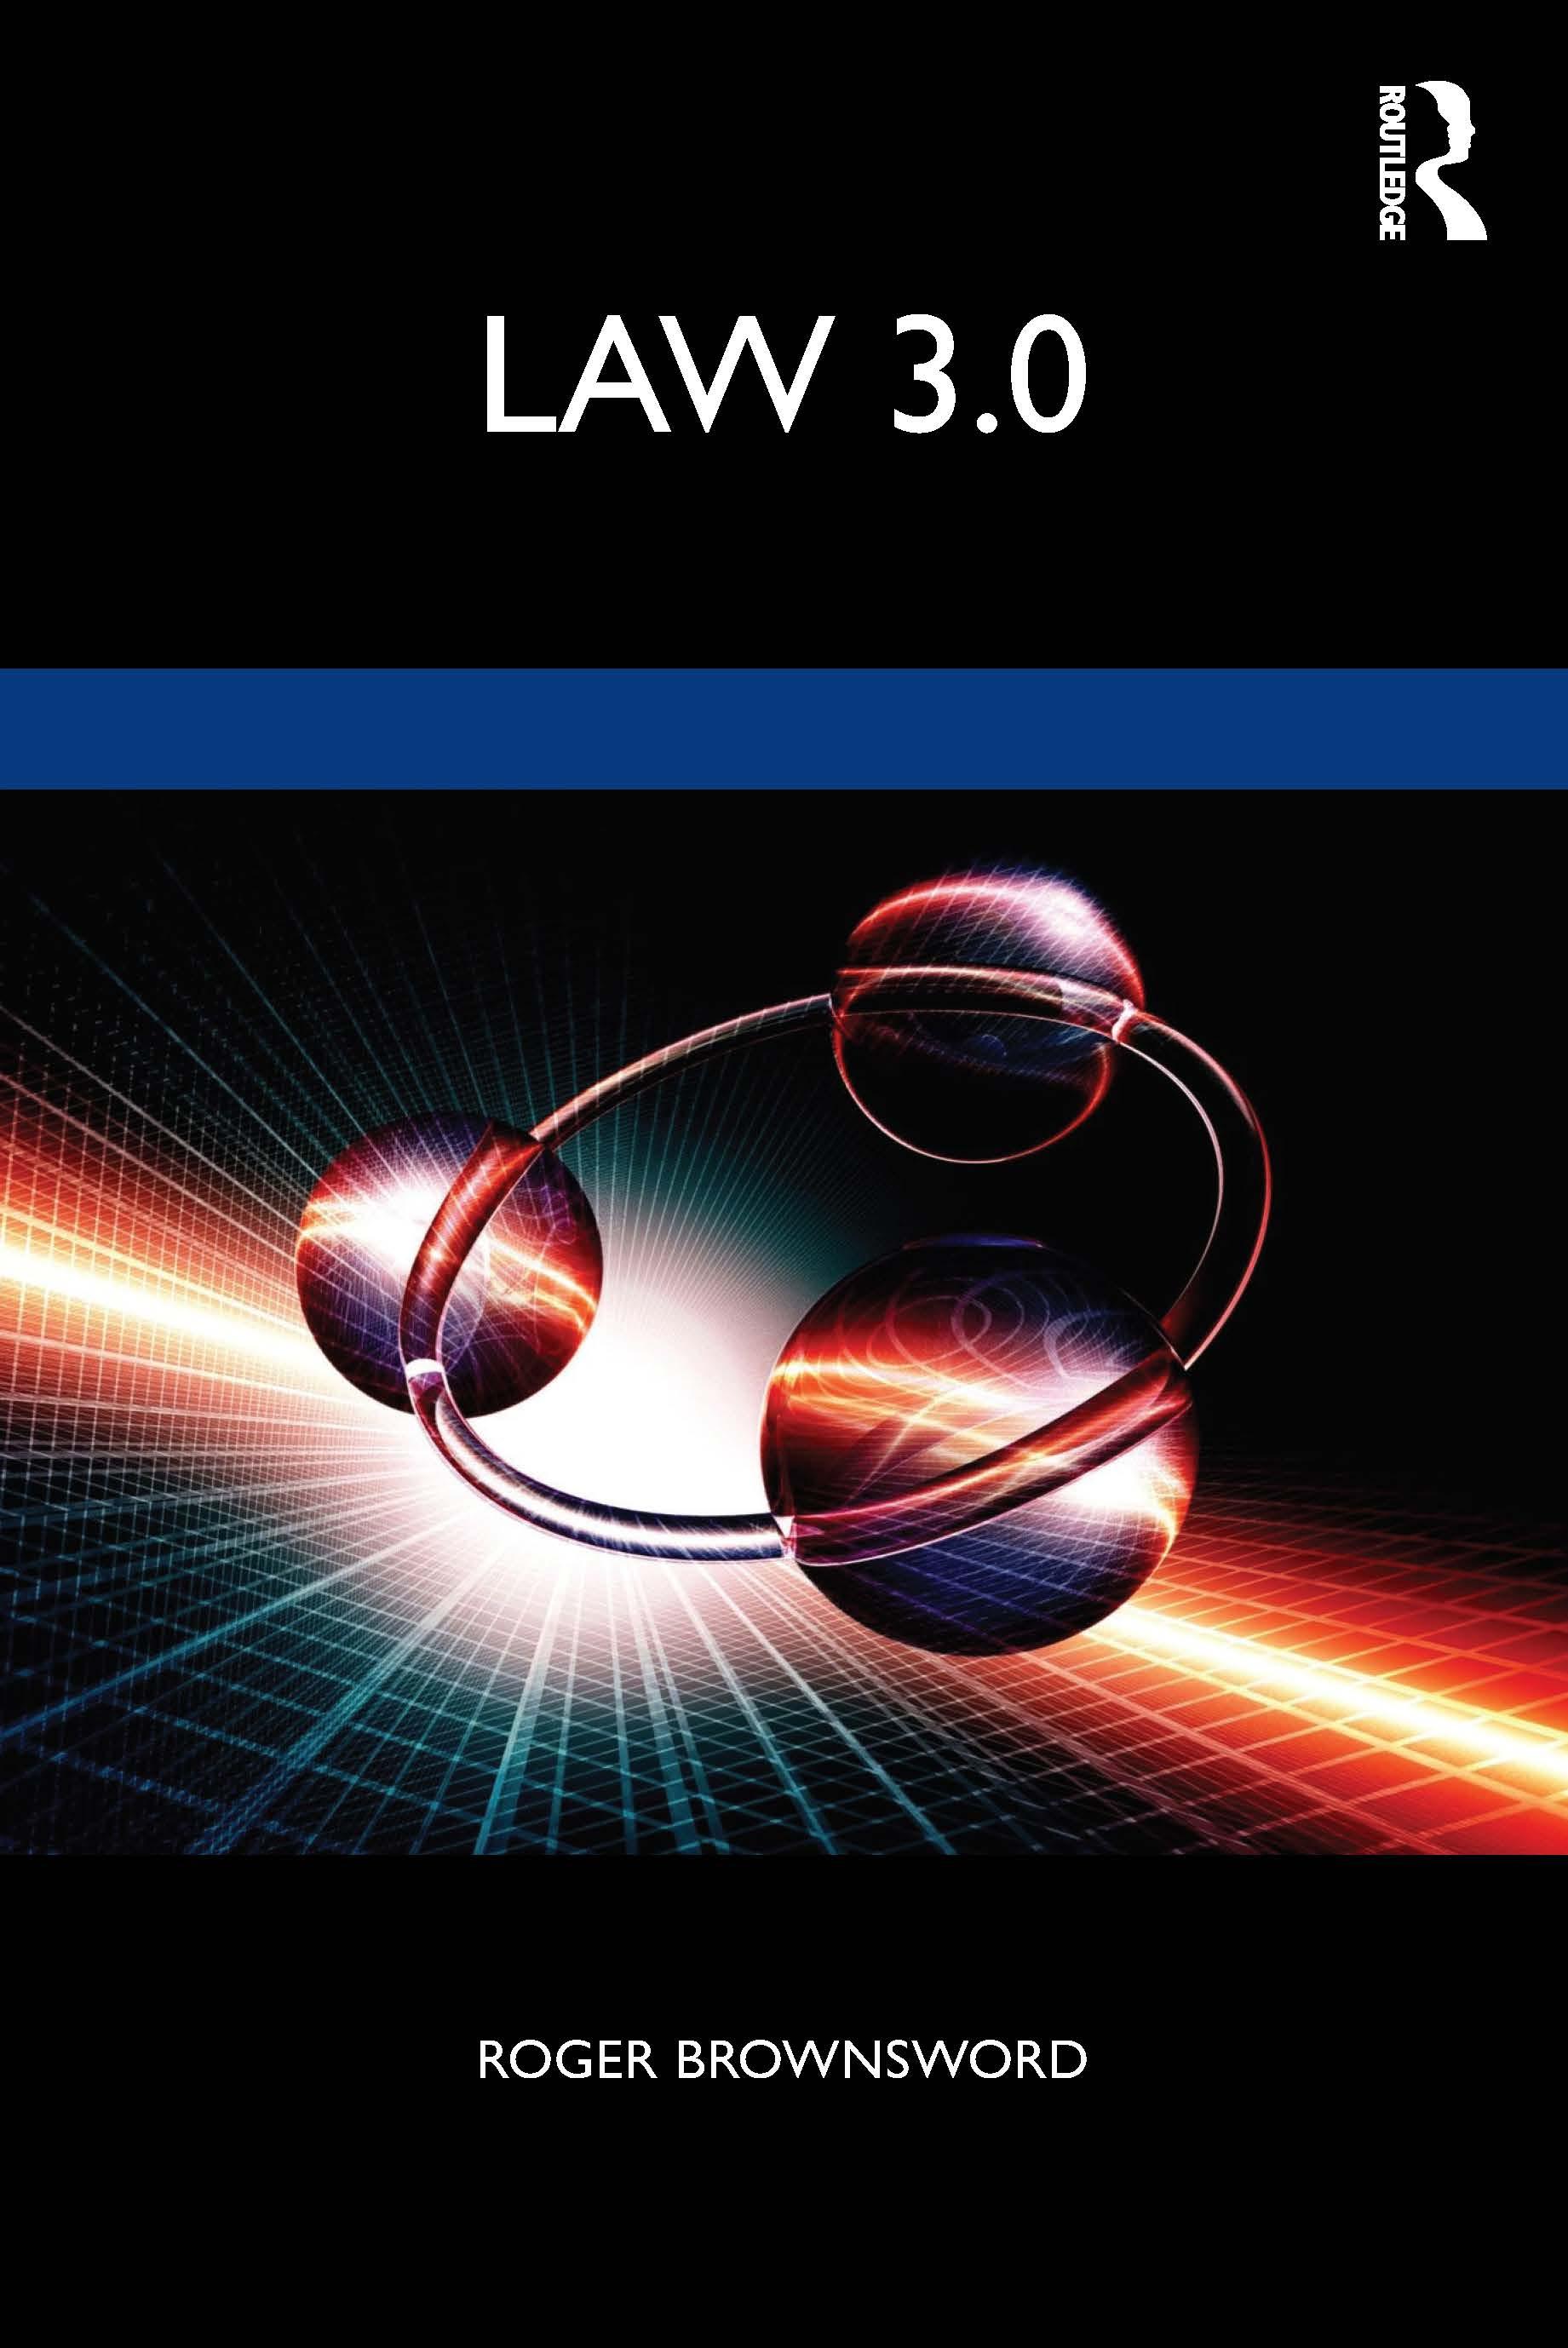 Law 3.0